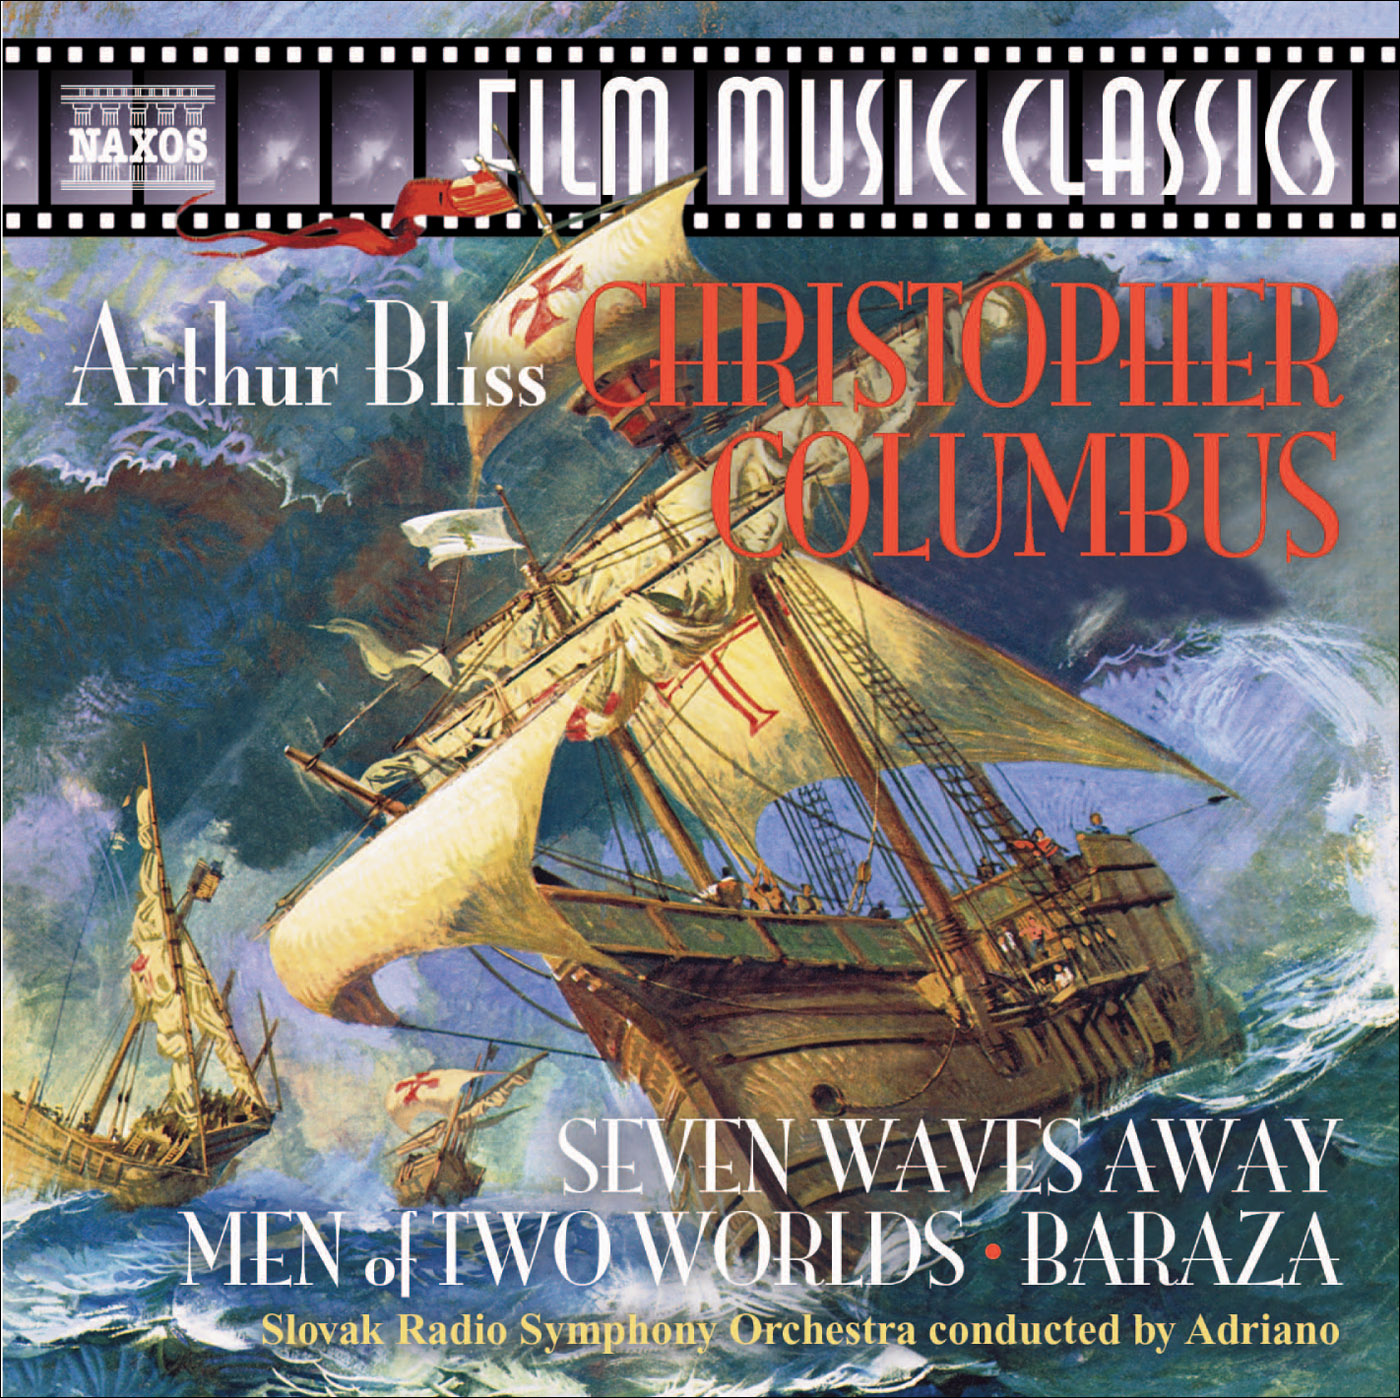 Bliss, A.: Christopher Columbus